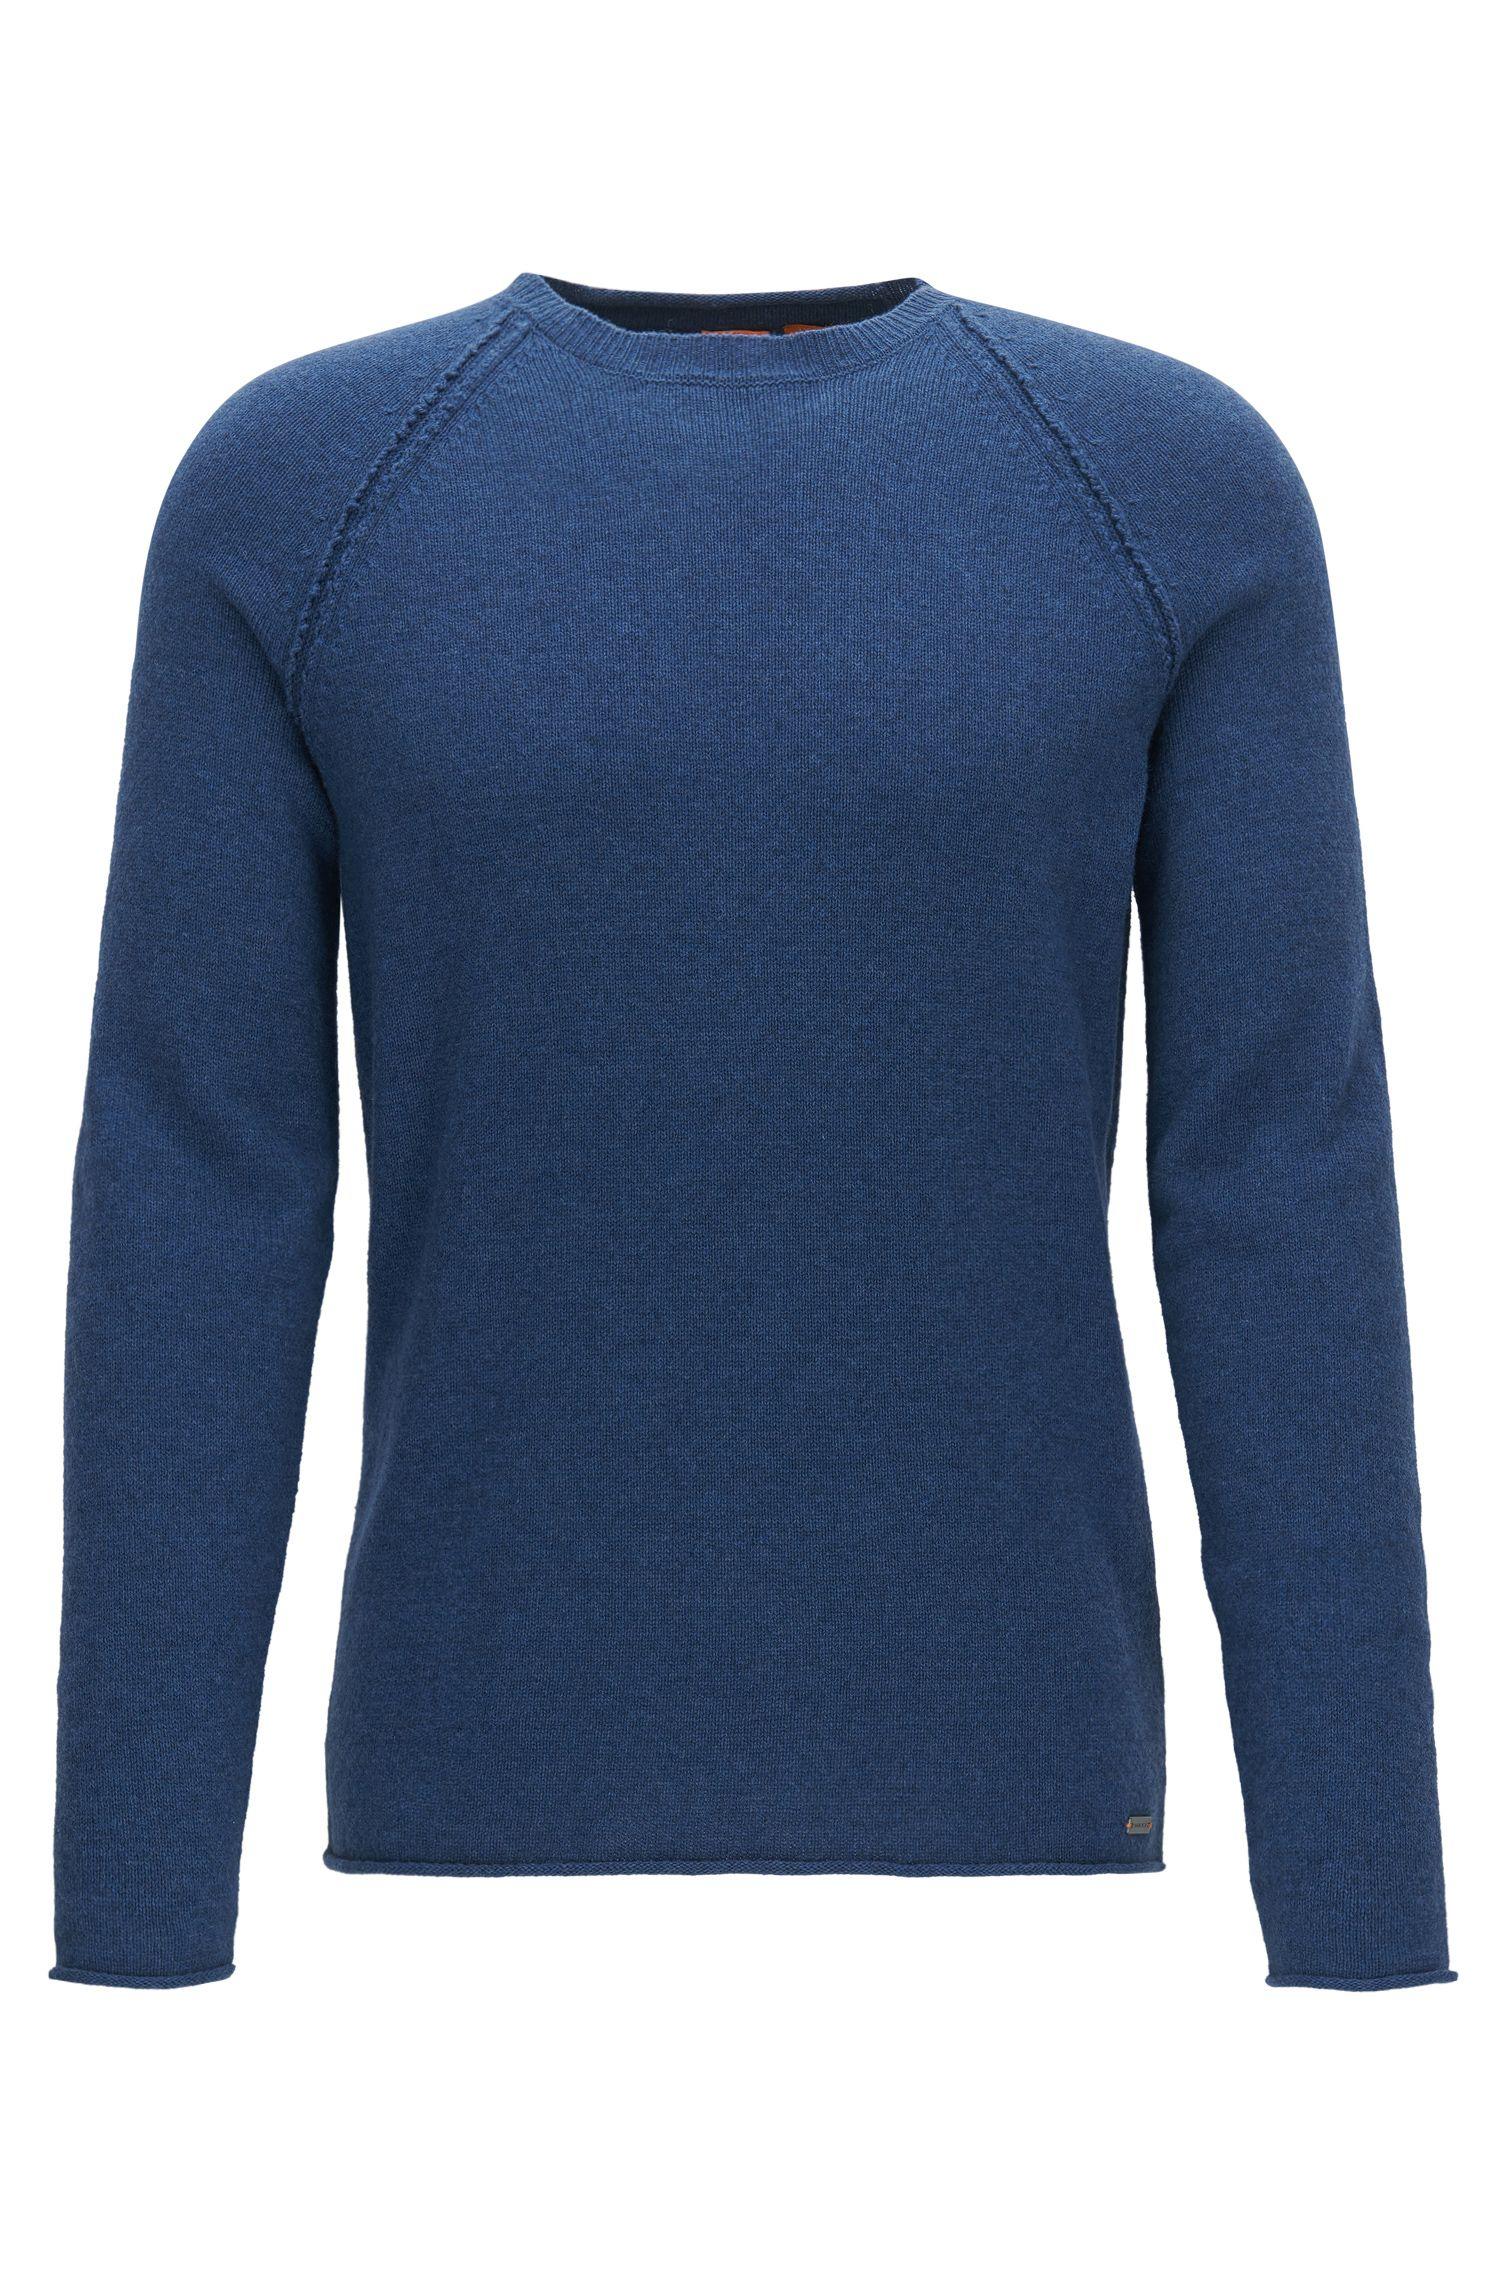 Wool-Cotton Blend Sweater | Kohedge